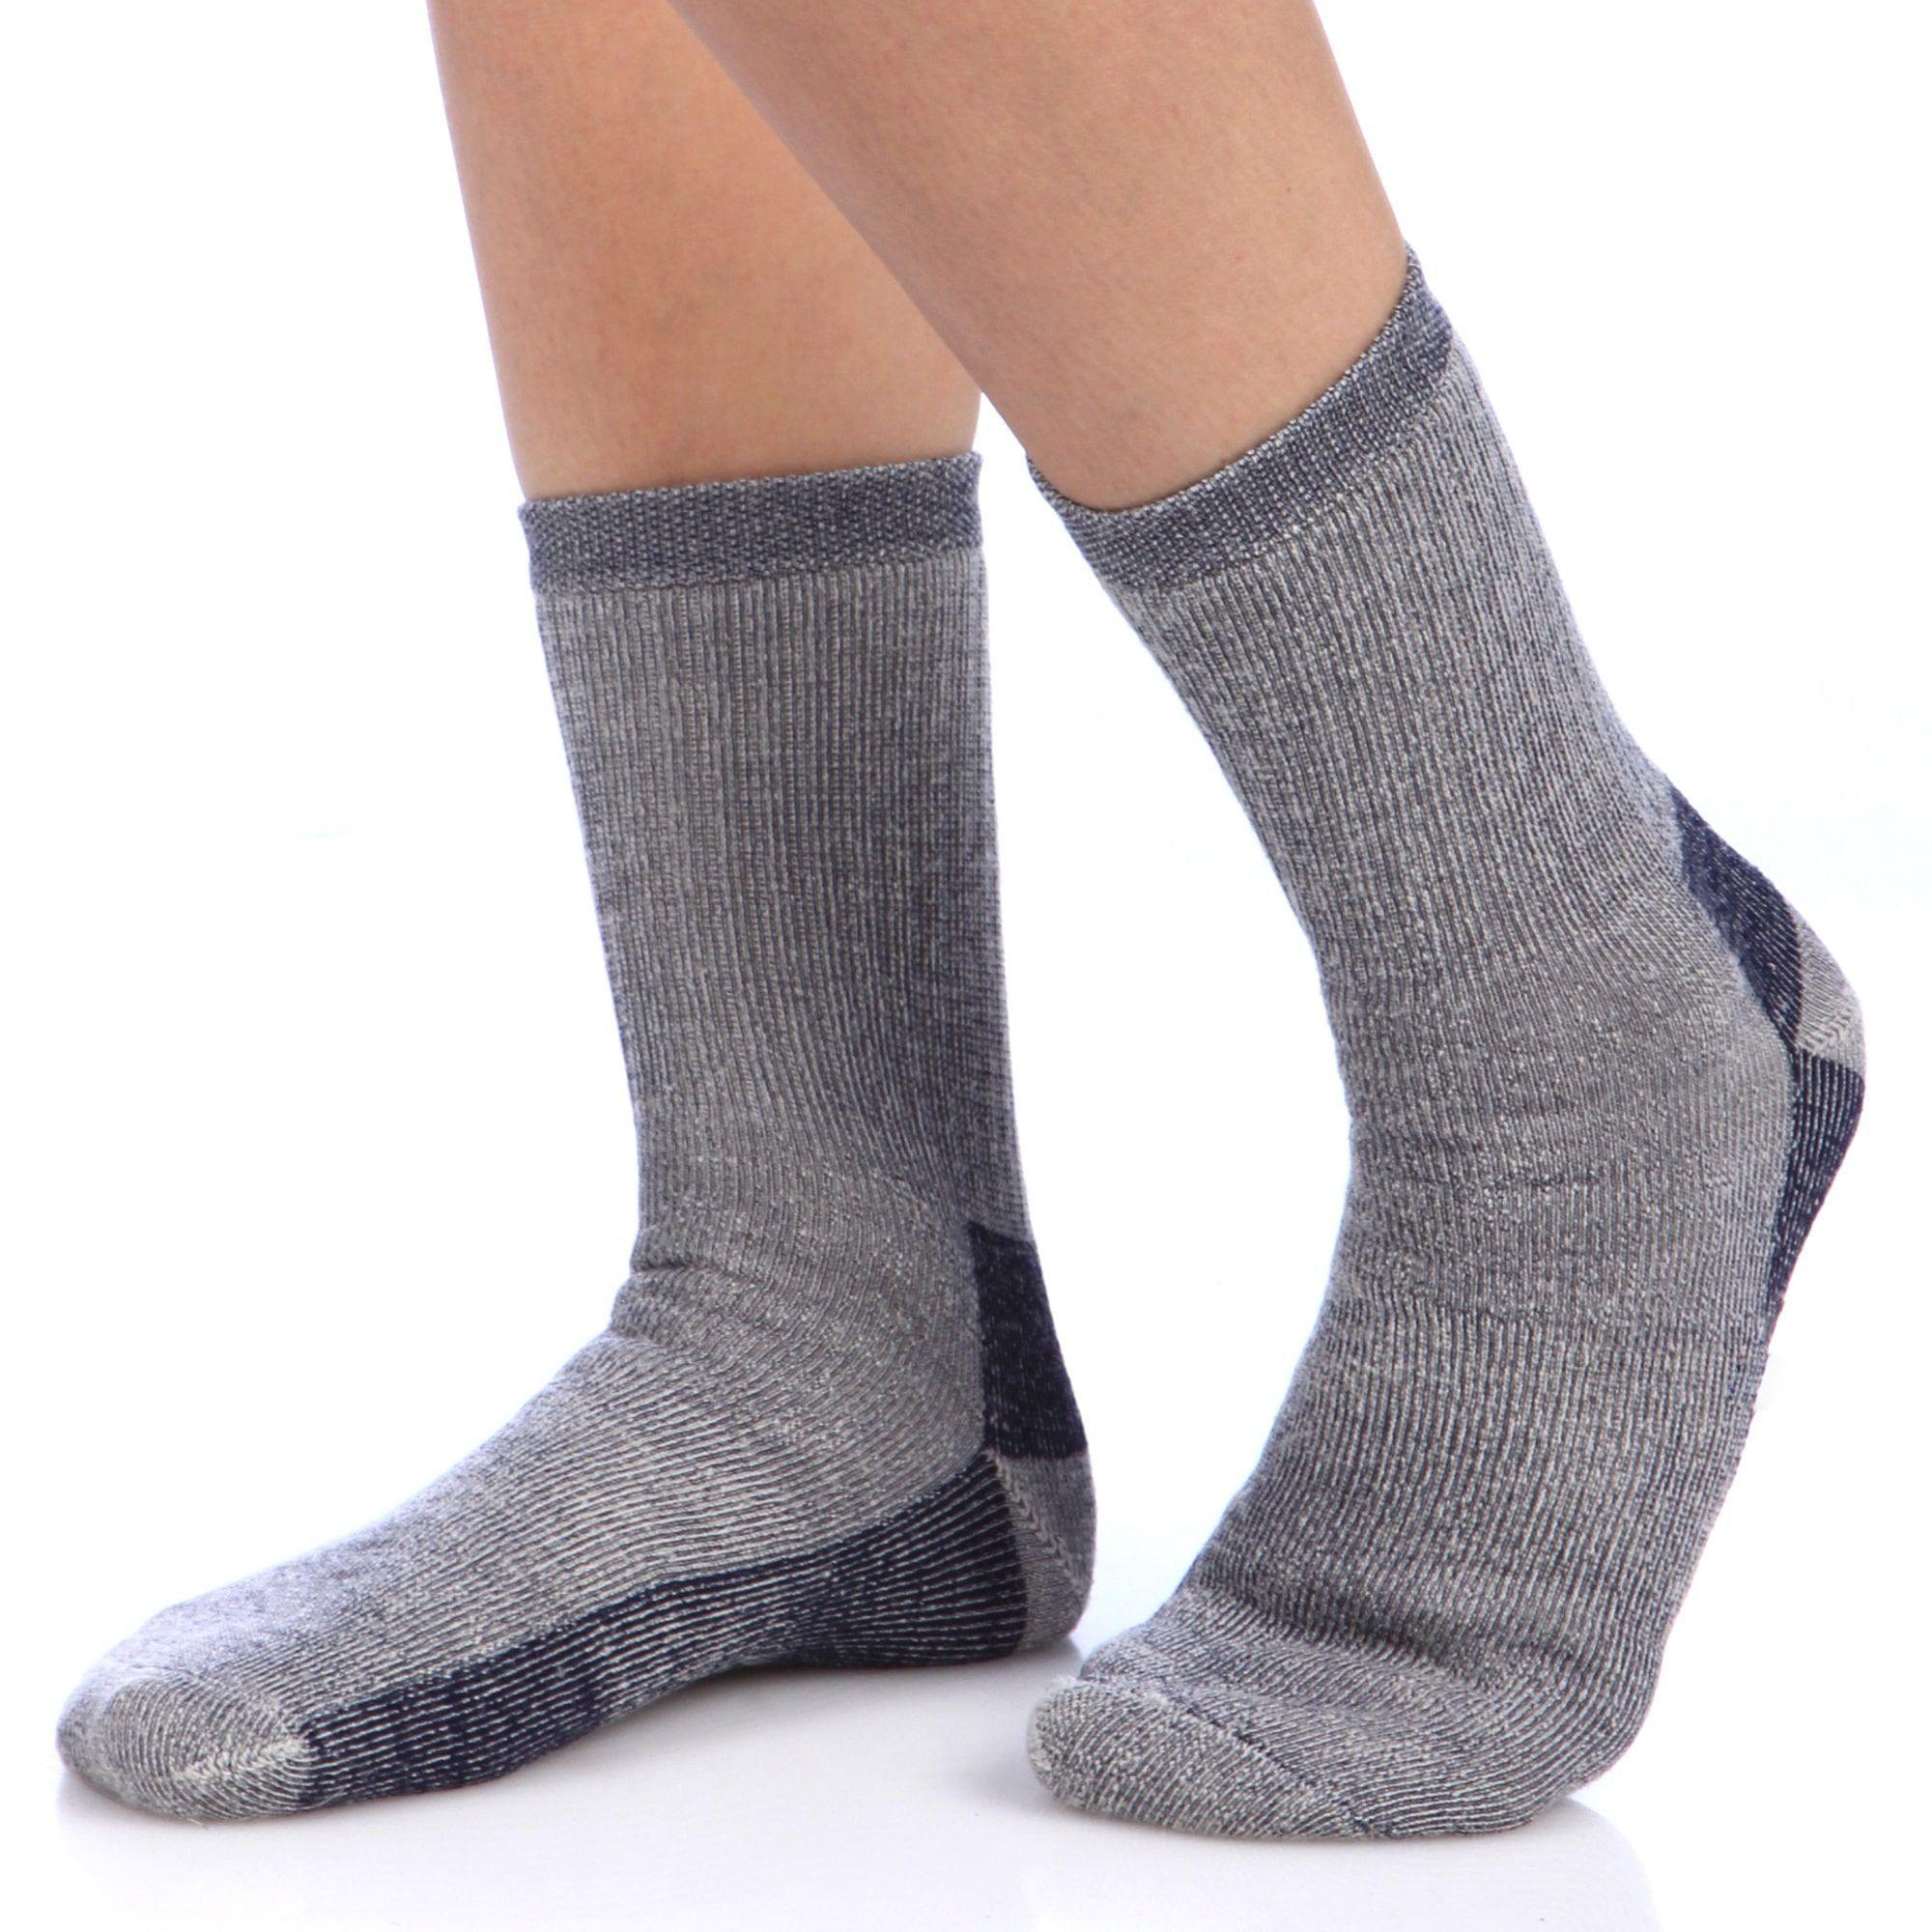 Smart Socks Navy Blue Merino Wool Crew Hiking Socks Pack of 3 M